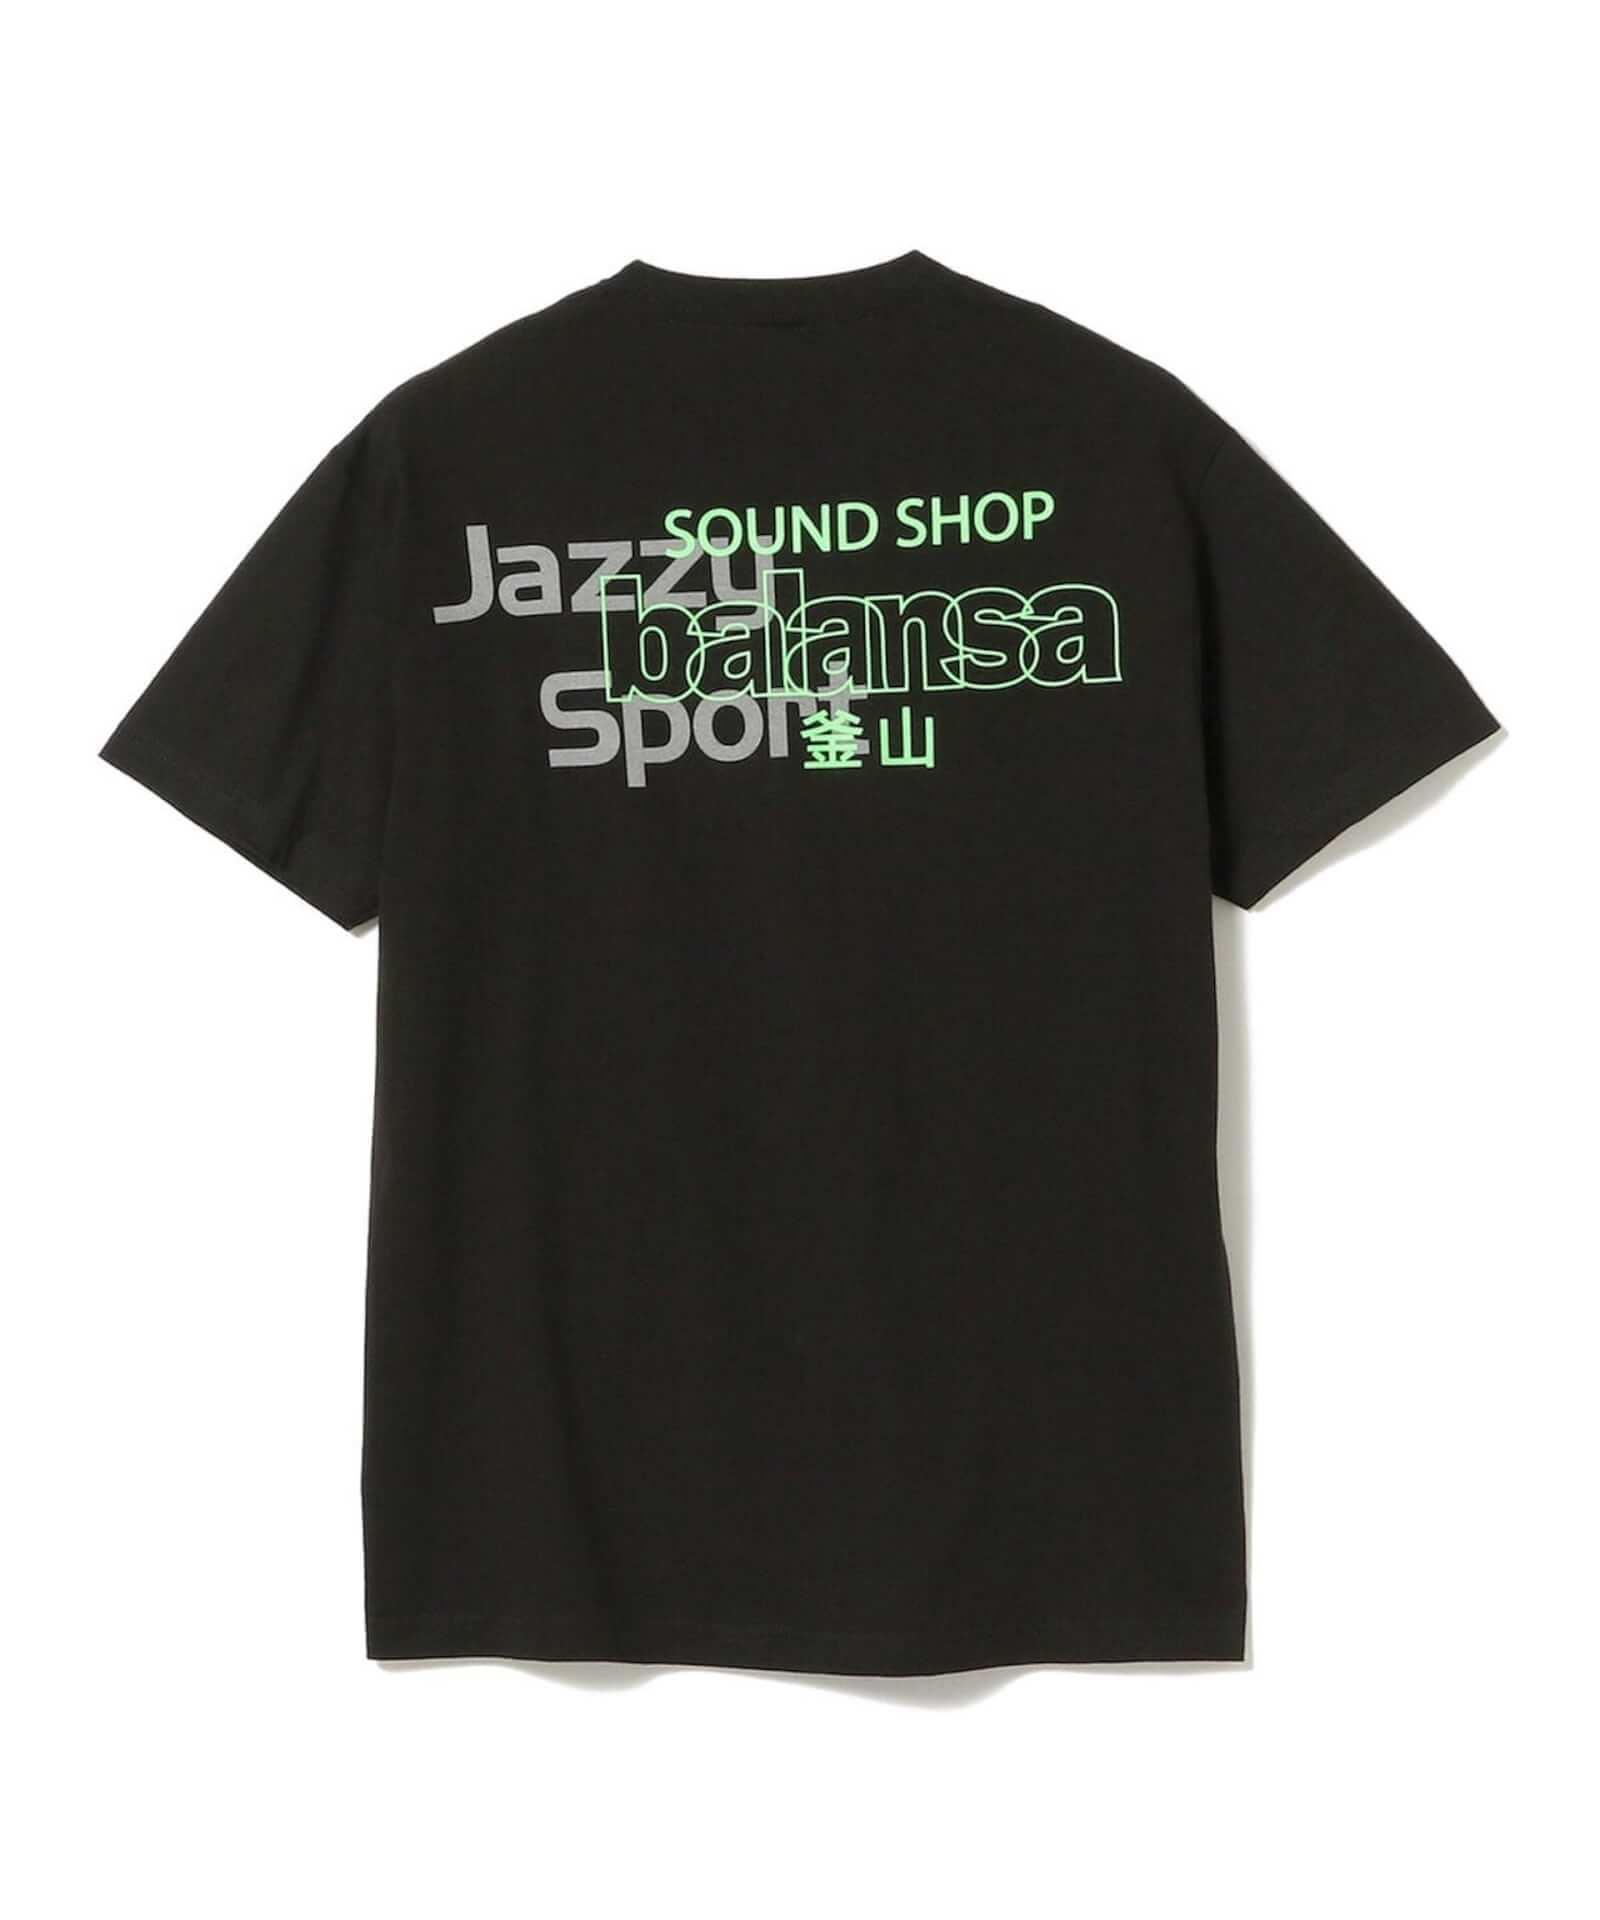 Jazzy Sport×SOUND SHOP balansaコラボTシャツがリリース決定!Beams限定販売&韓国限定のデザインも 11086034600_C_1